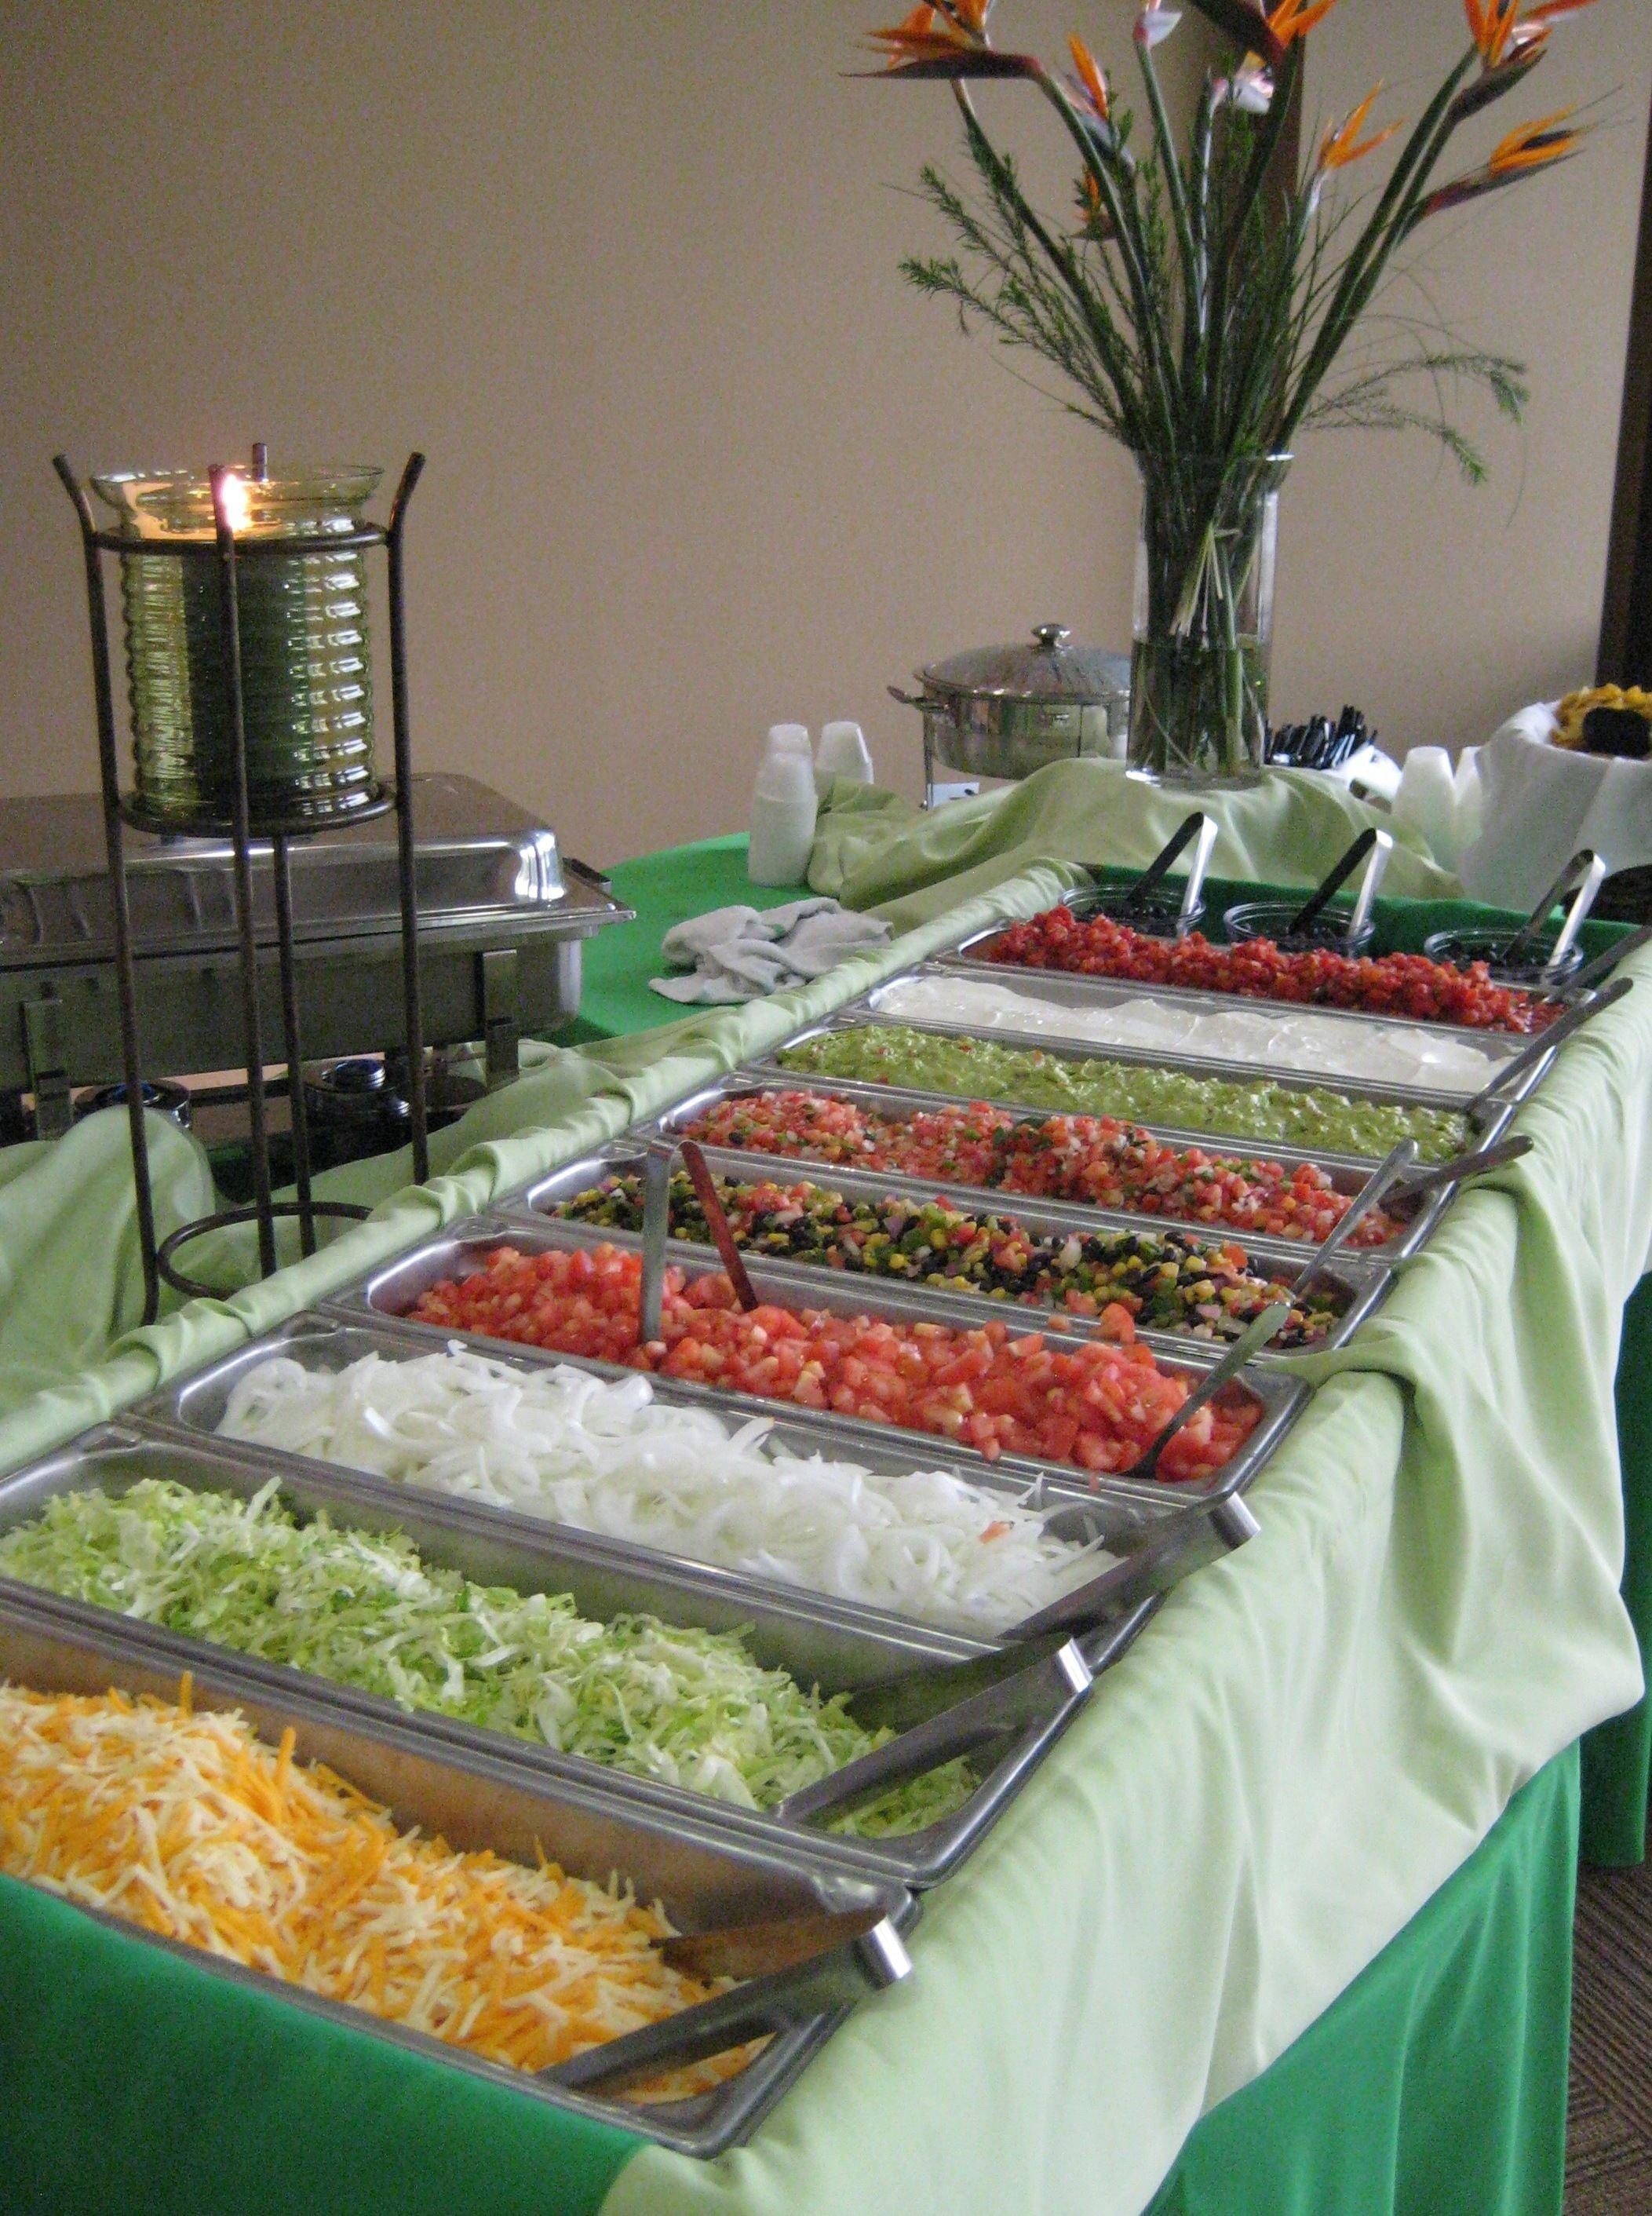 10 Stylish Graduation Open House Menu Ideas neat ideataco bar for the reception easy affordable yummy 1 2020